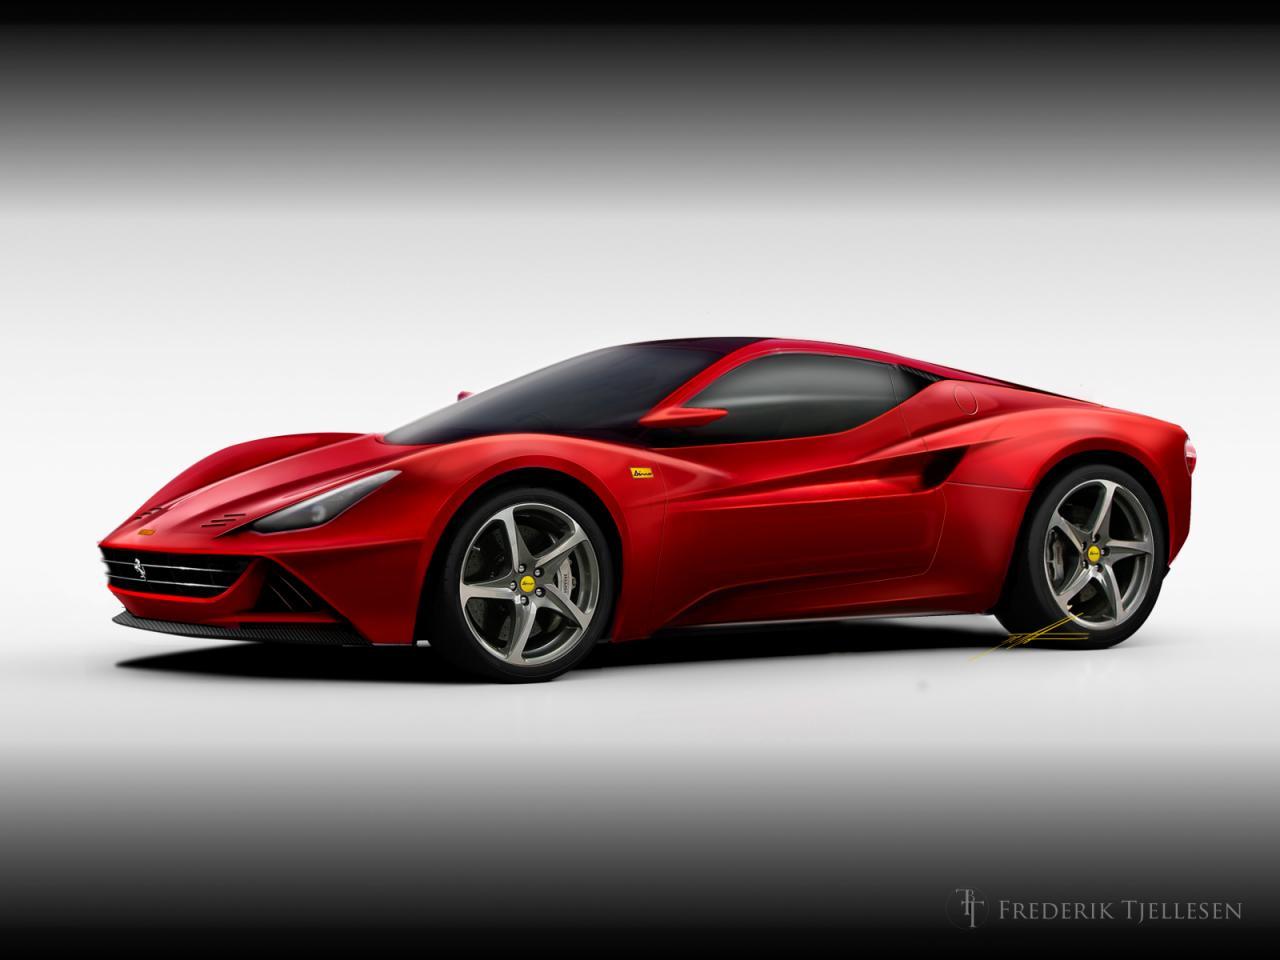 Ferrari Dino 2015 render by Frederik Tjellesen